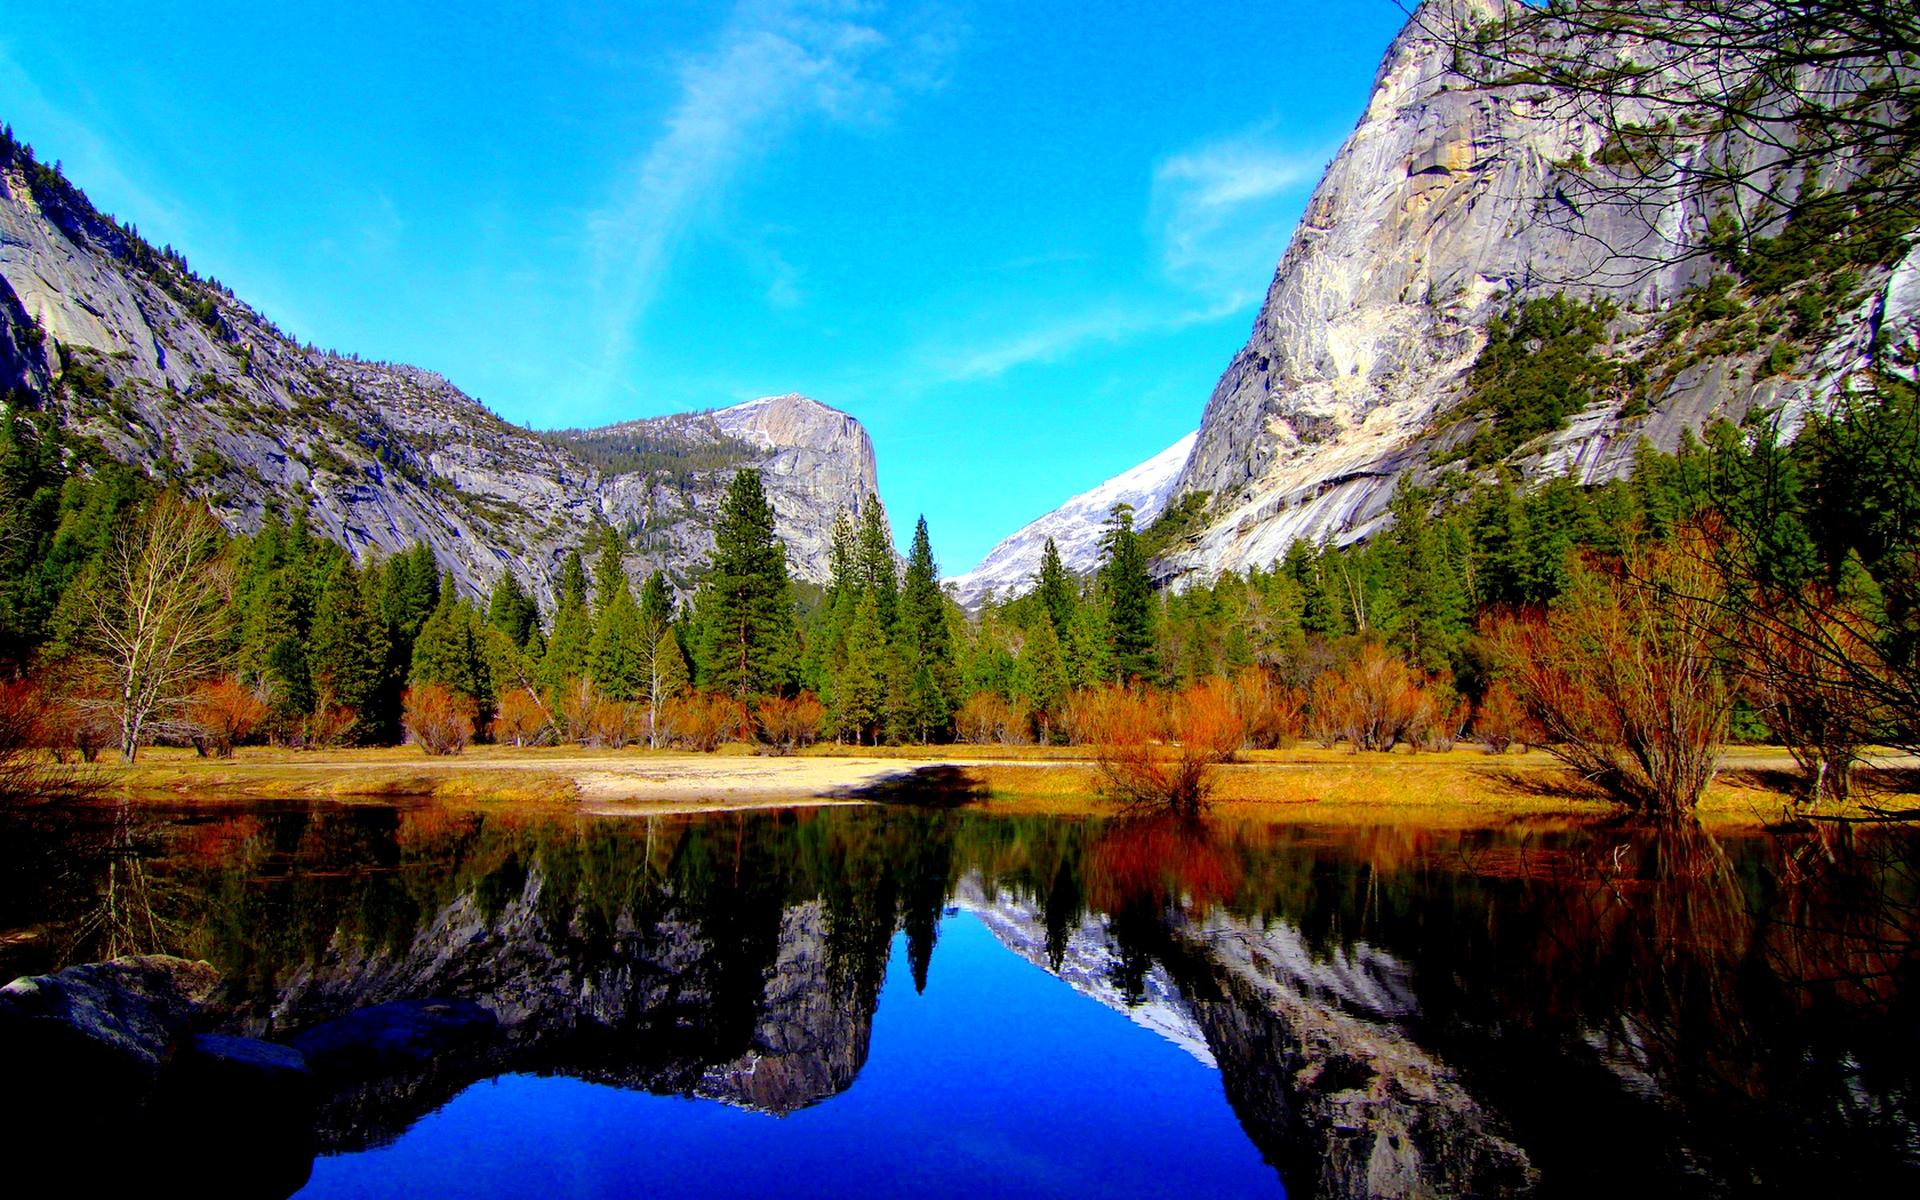 Hd Summer Hd Wallpapers   Yosemite National Park   1920x1200 1920x1200